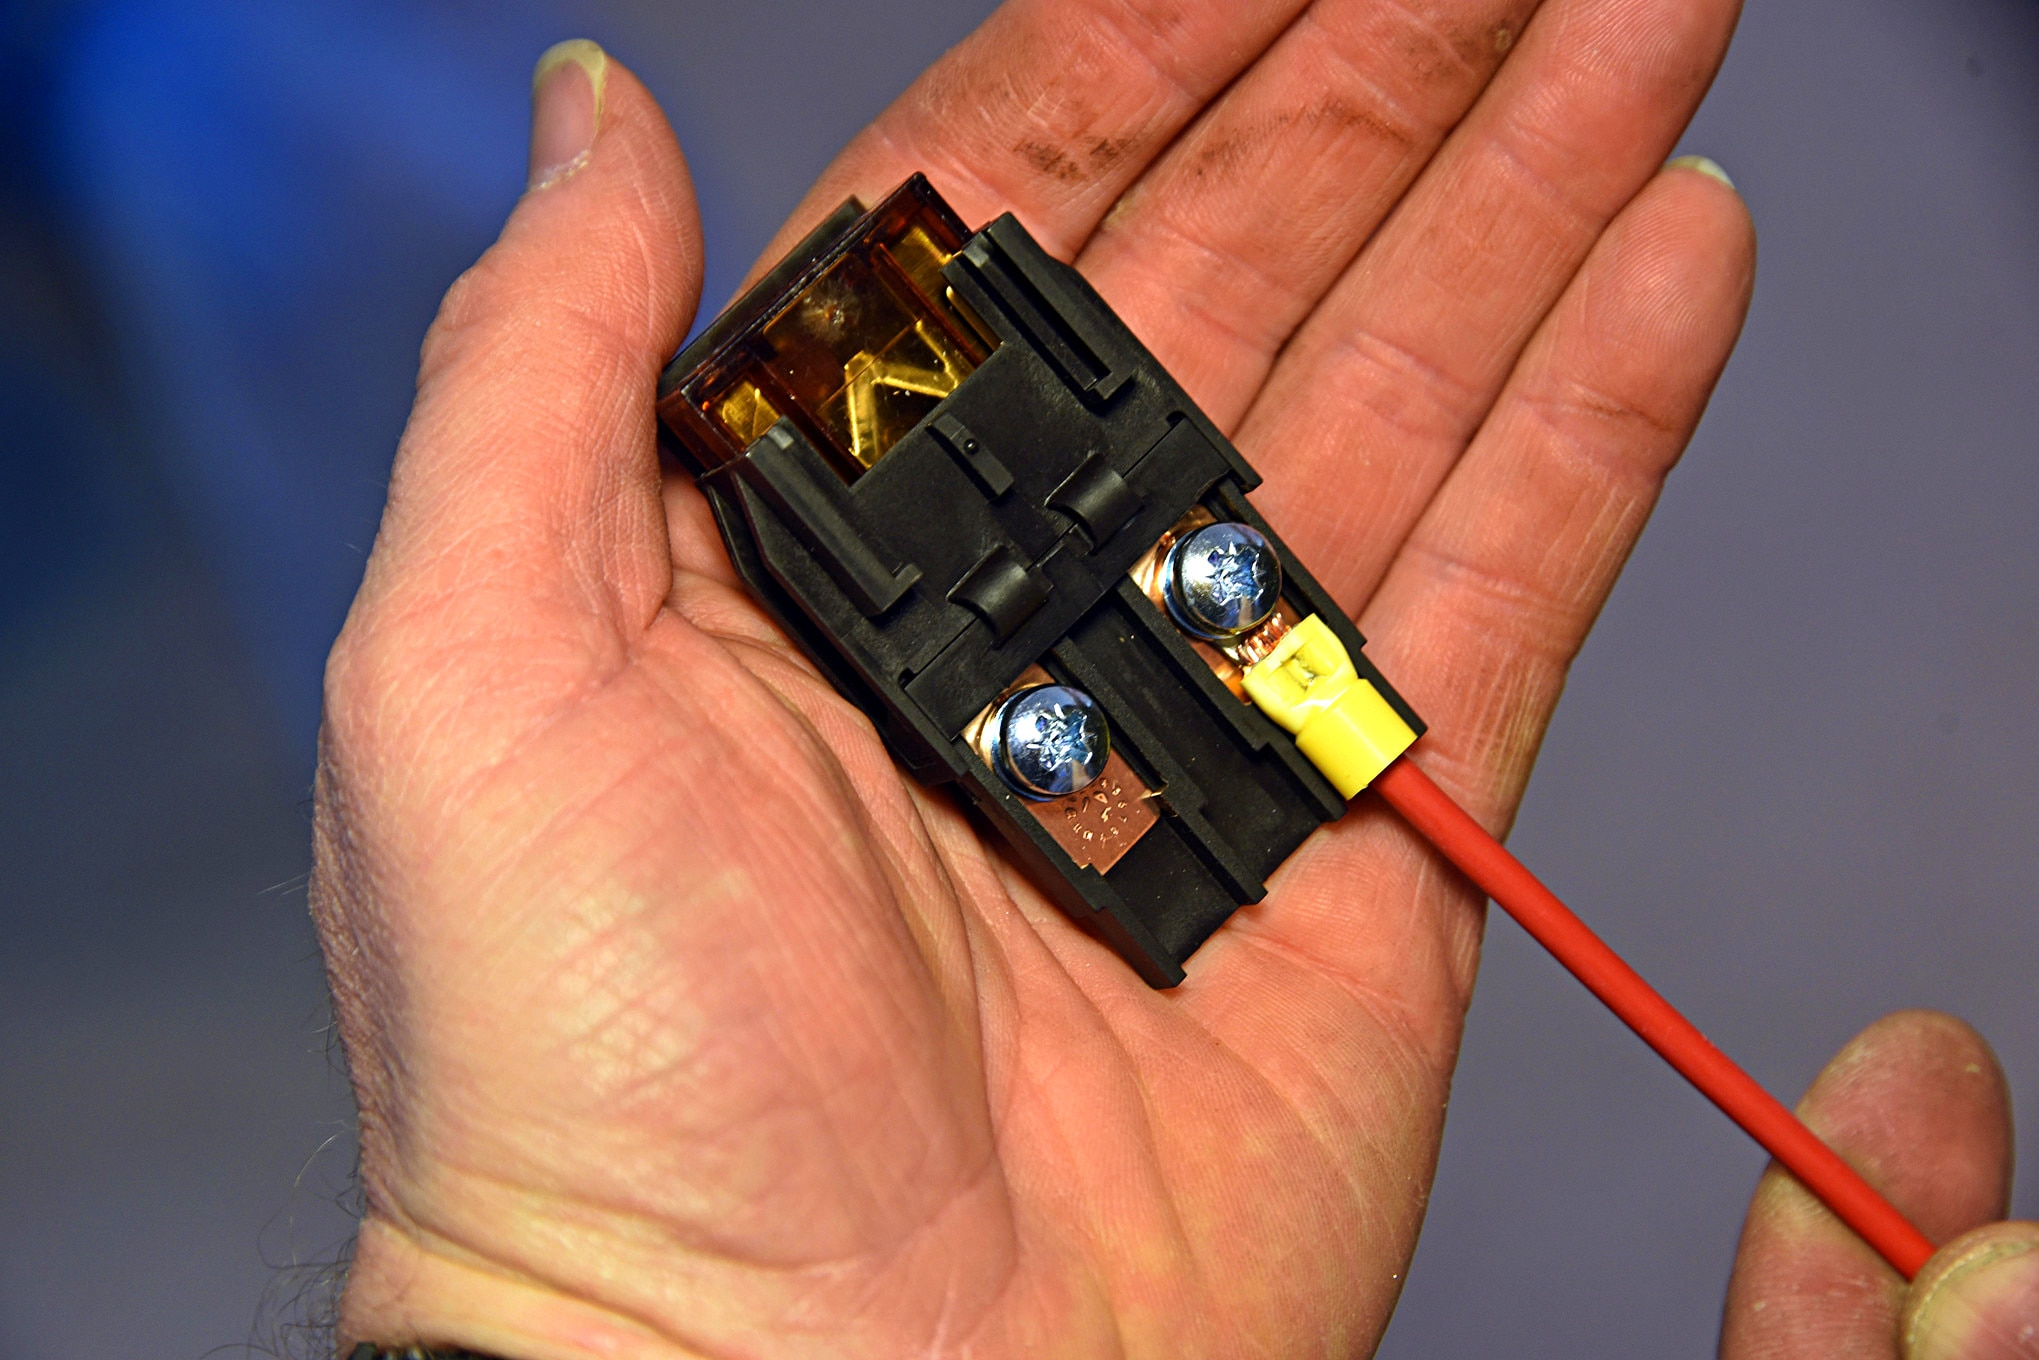 Dimmer Switch Wiring Diagram Old Telephone Wiring Diagram Utp Wiring